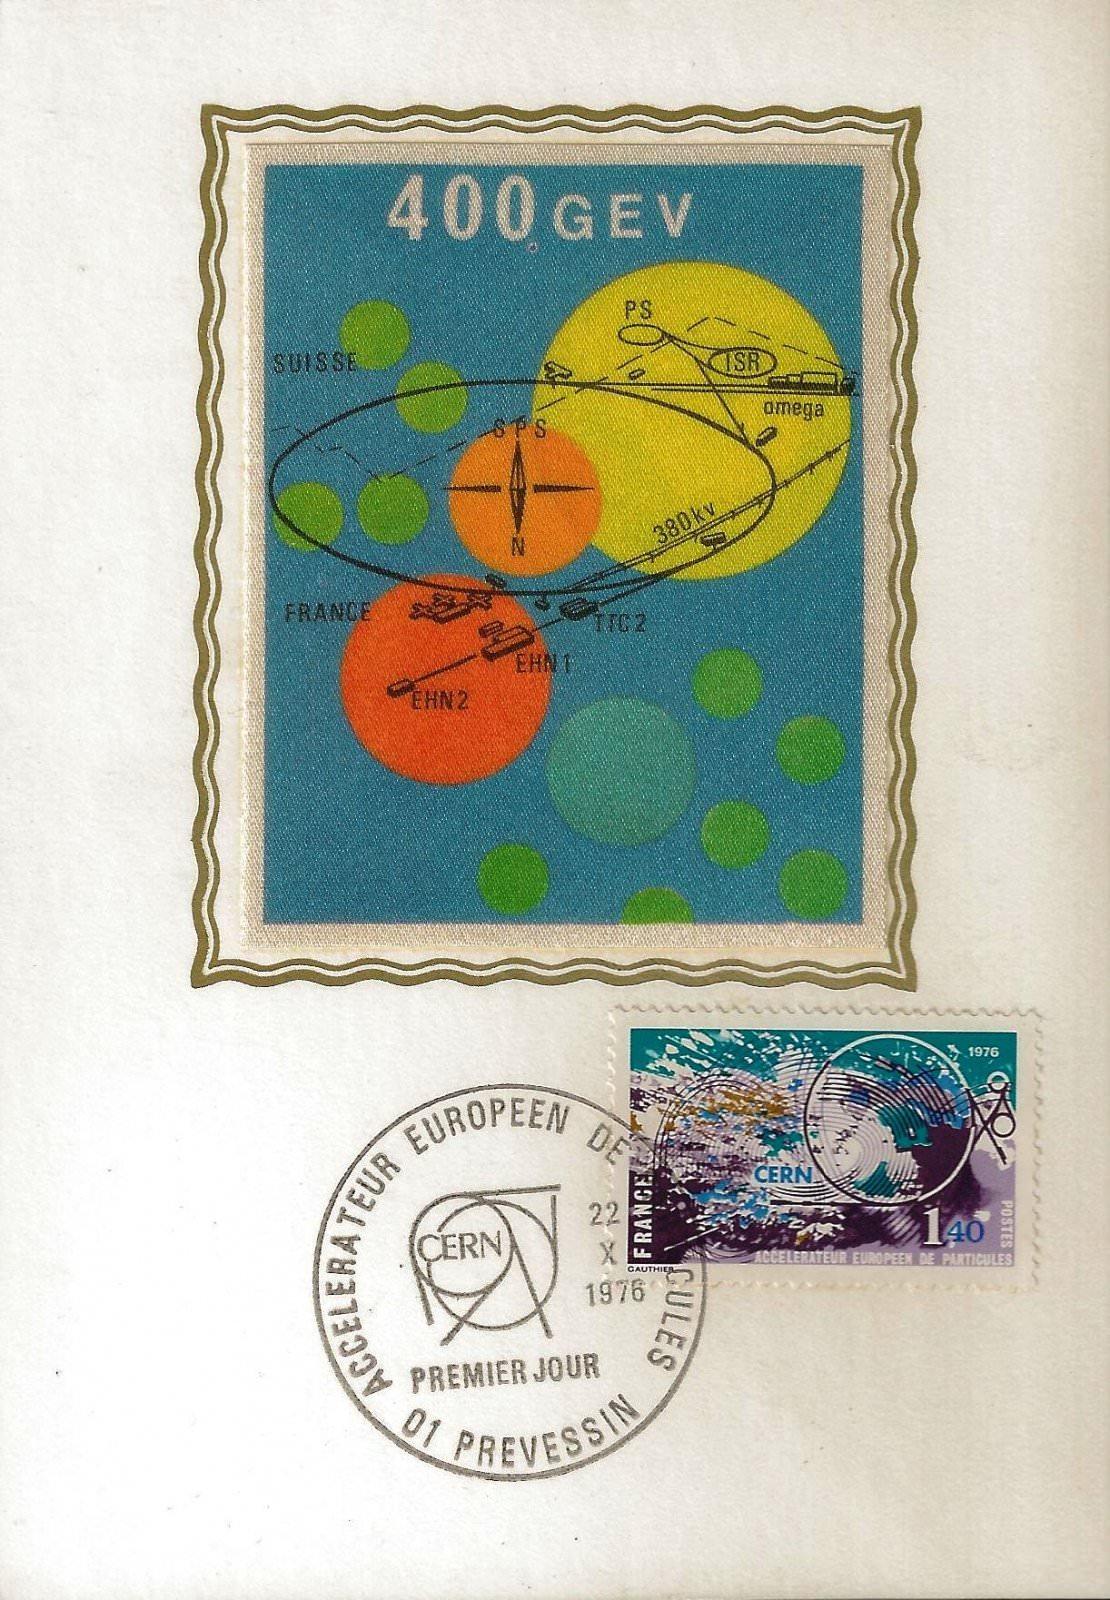 1976 ACCELERATEUR